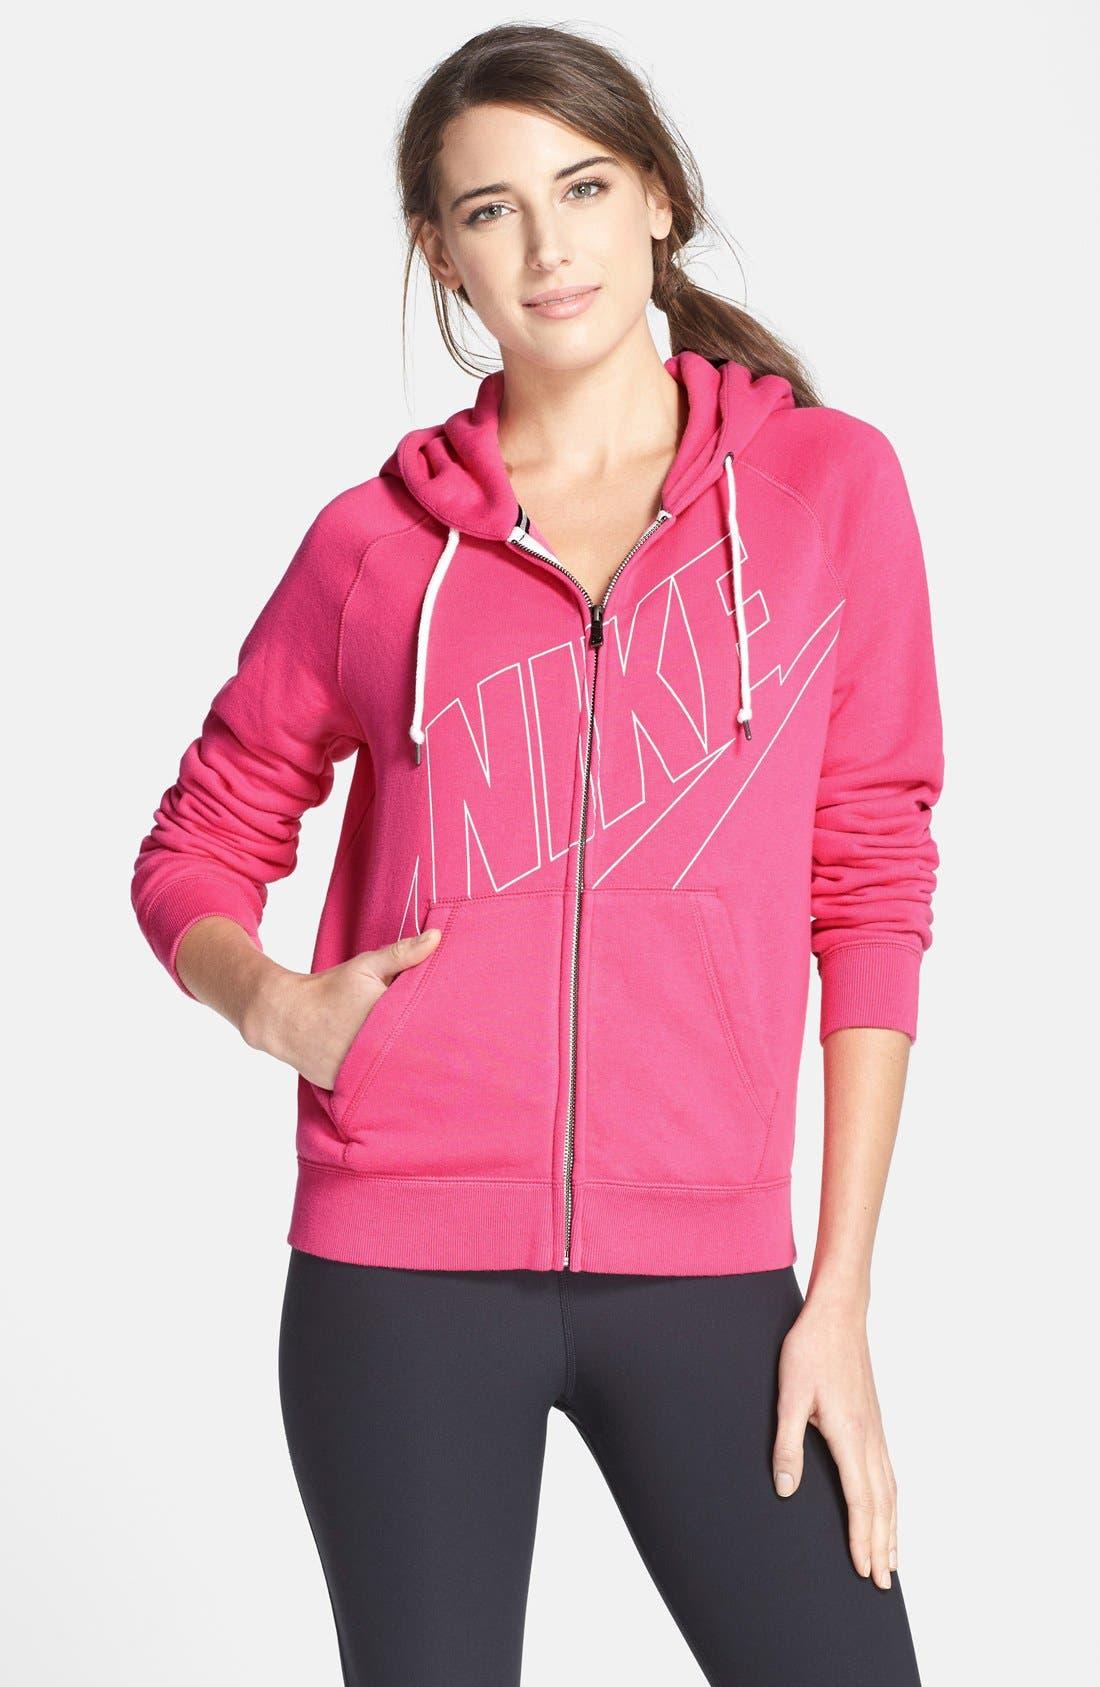 Main Image - Nike 'Rally' Zip Hoodie